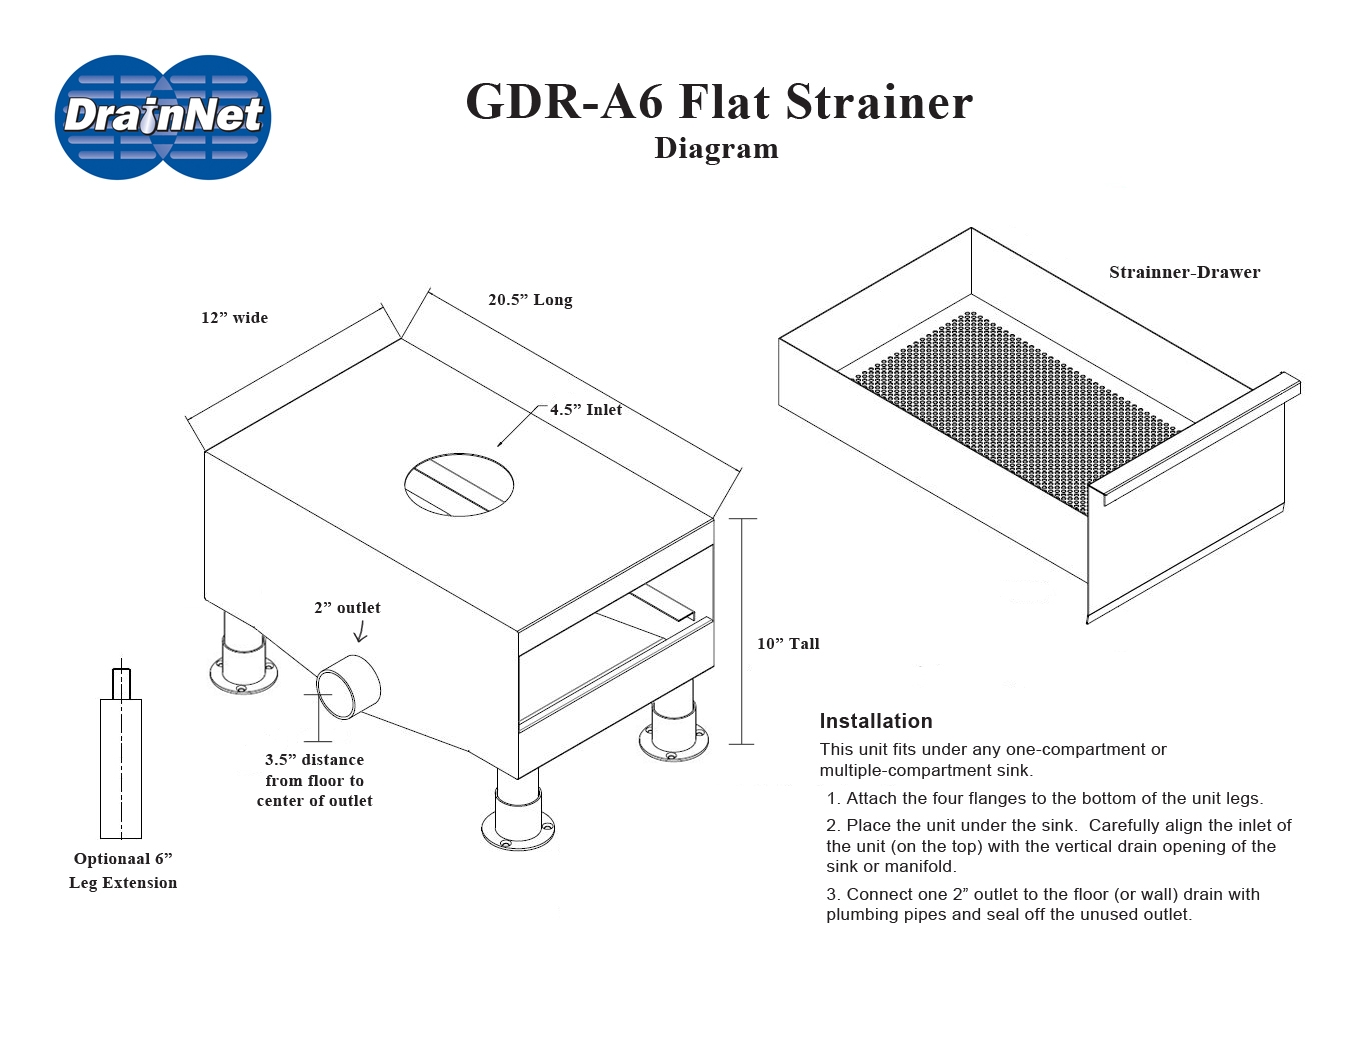 A6 Flat Strainer